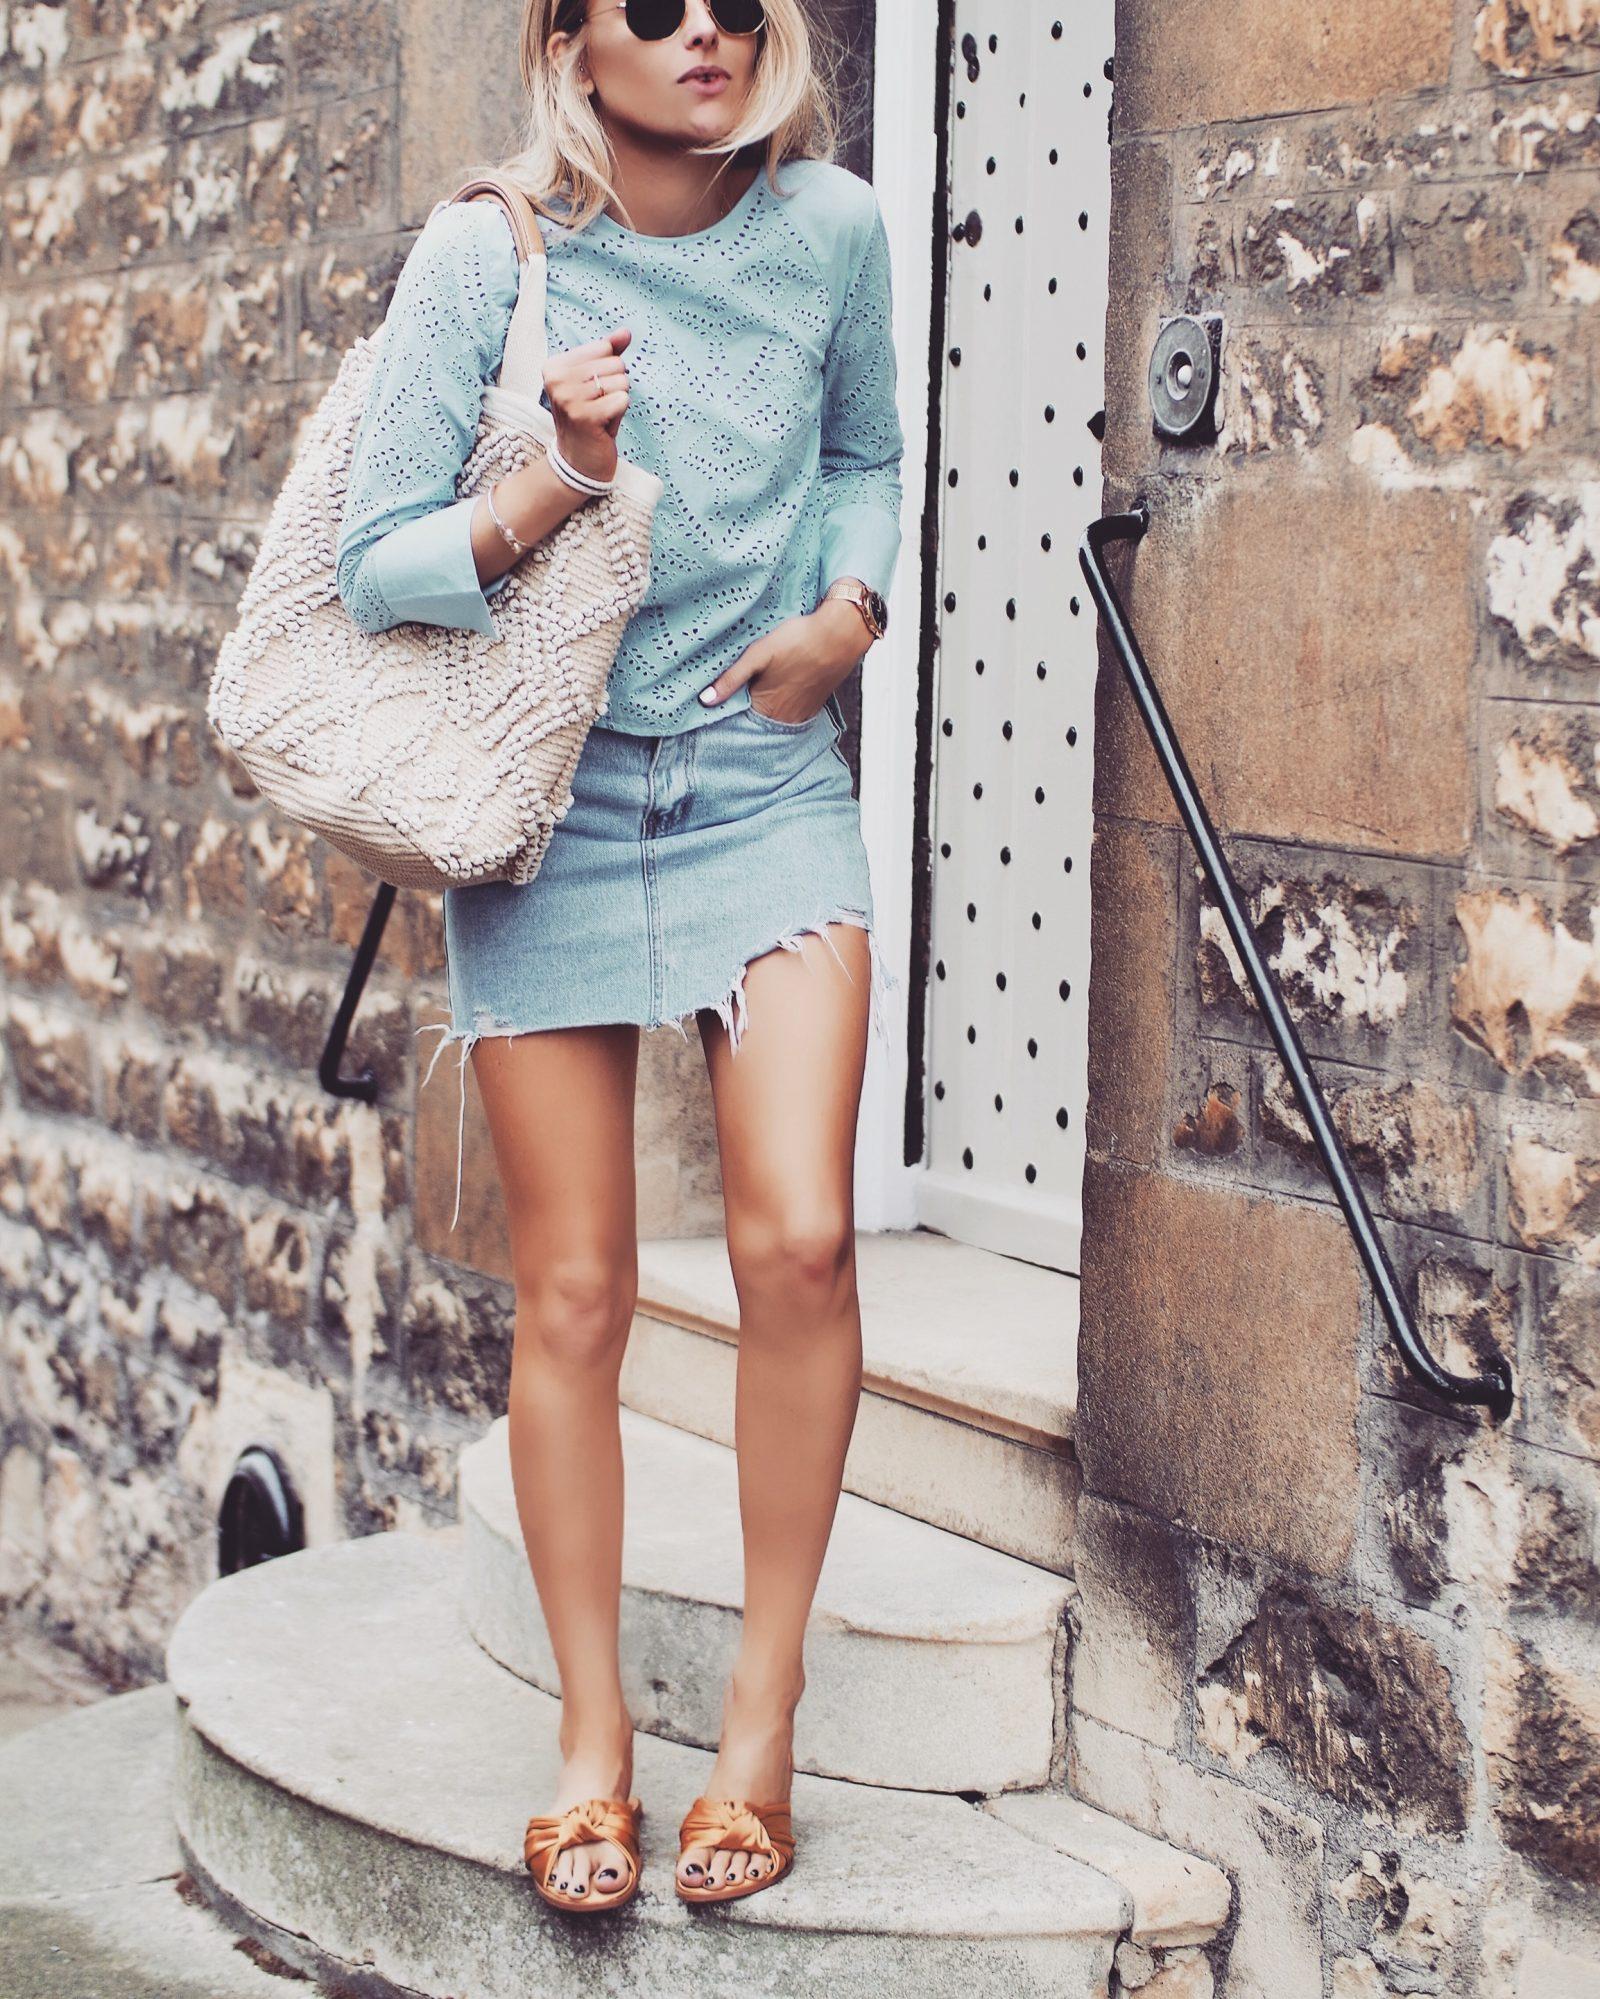 Basket Bag - Blue Crochet Top